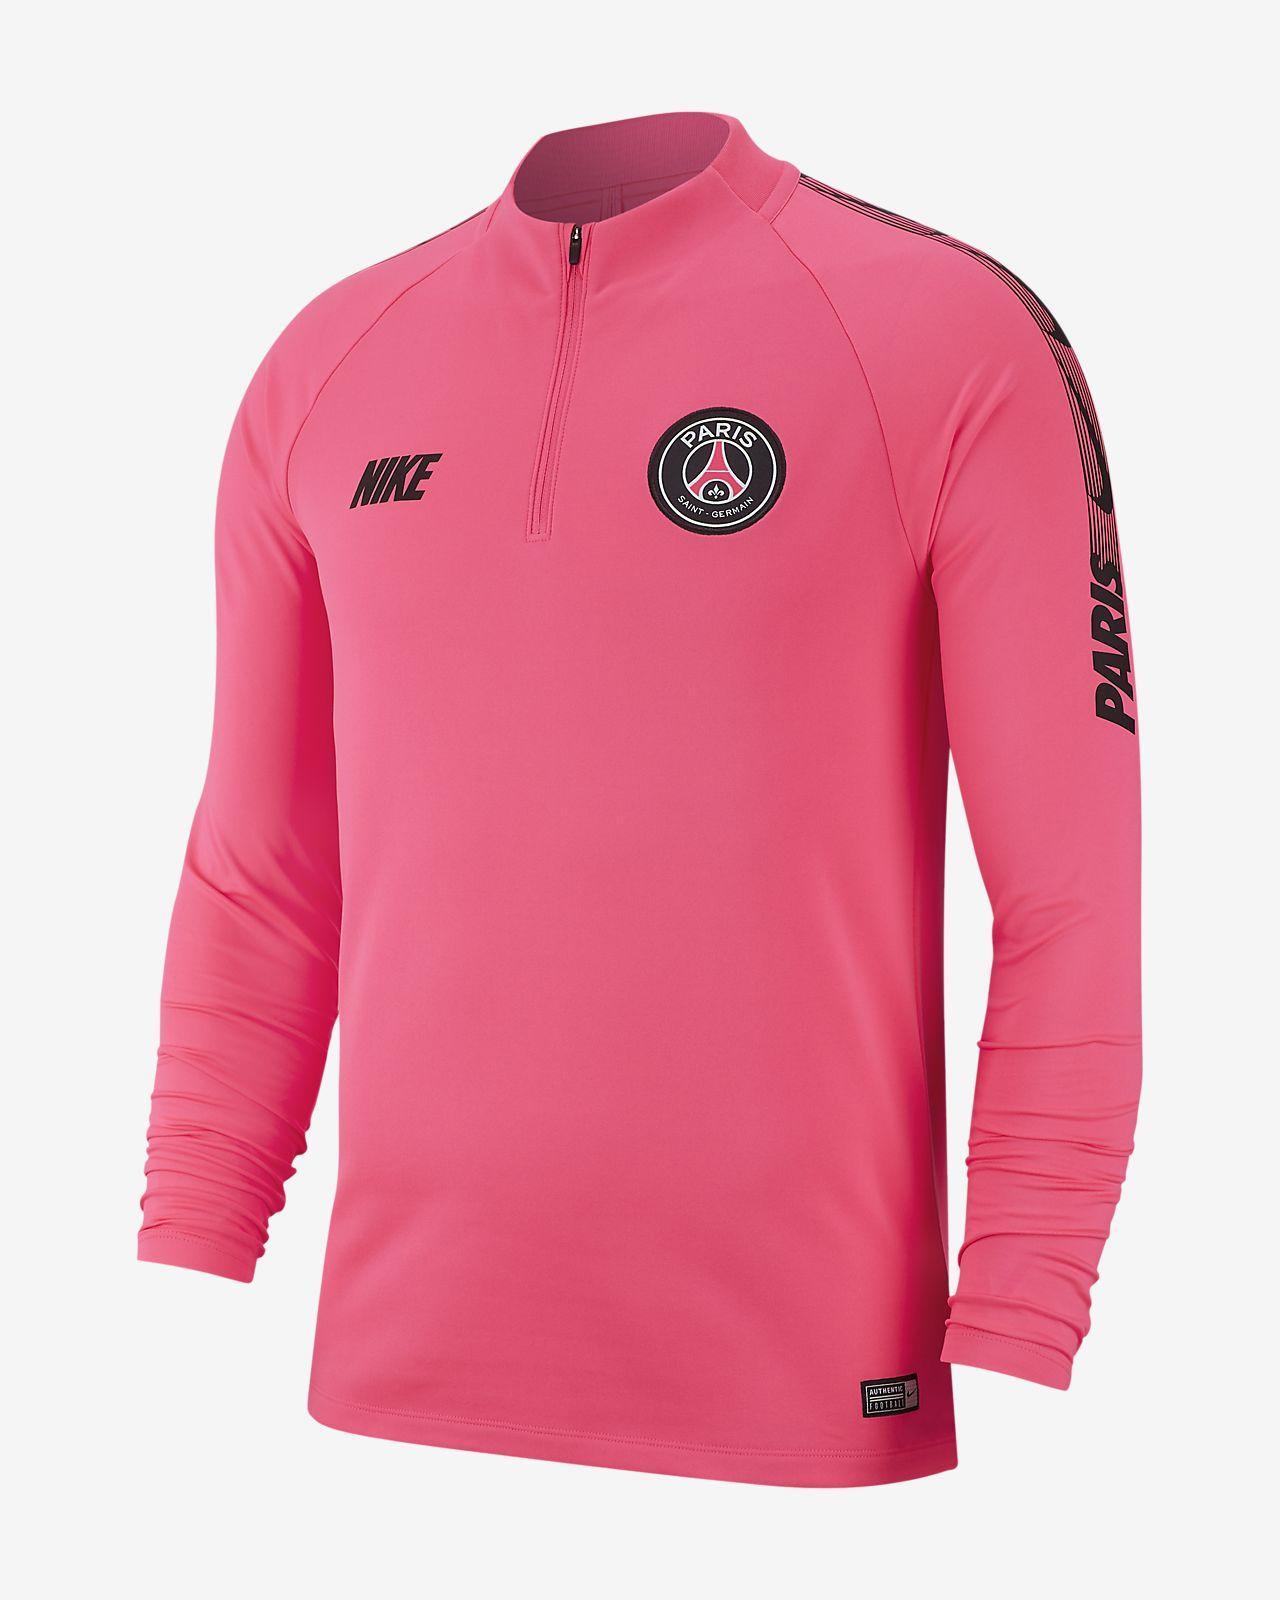 Paris Saint-Germain Dri-FIT Squad Drill Men's Long-Sleeve Football Top